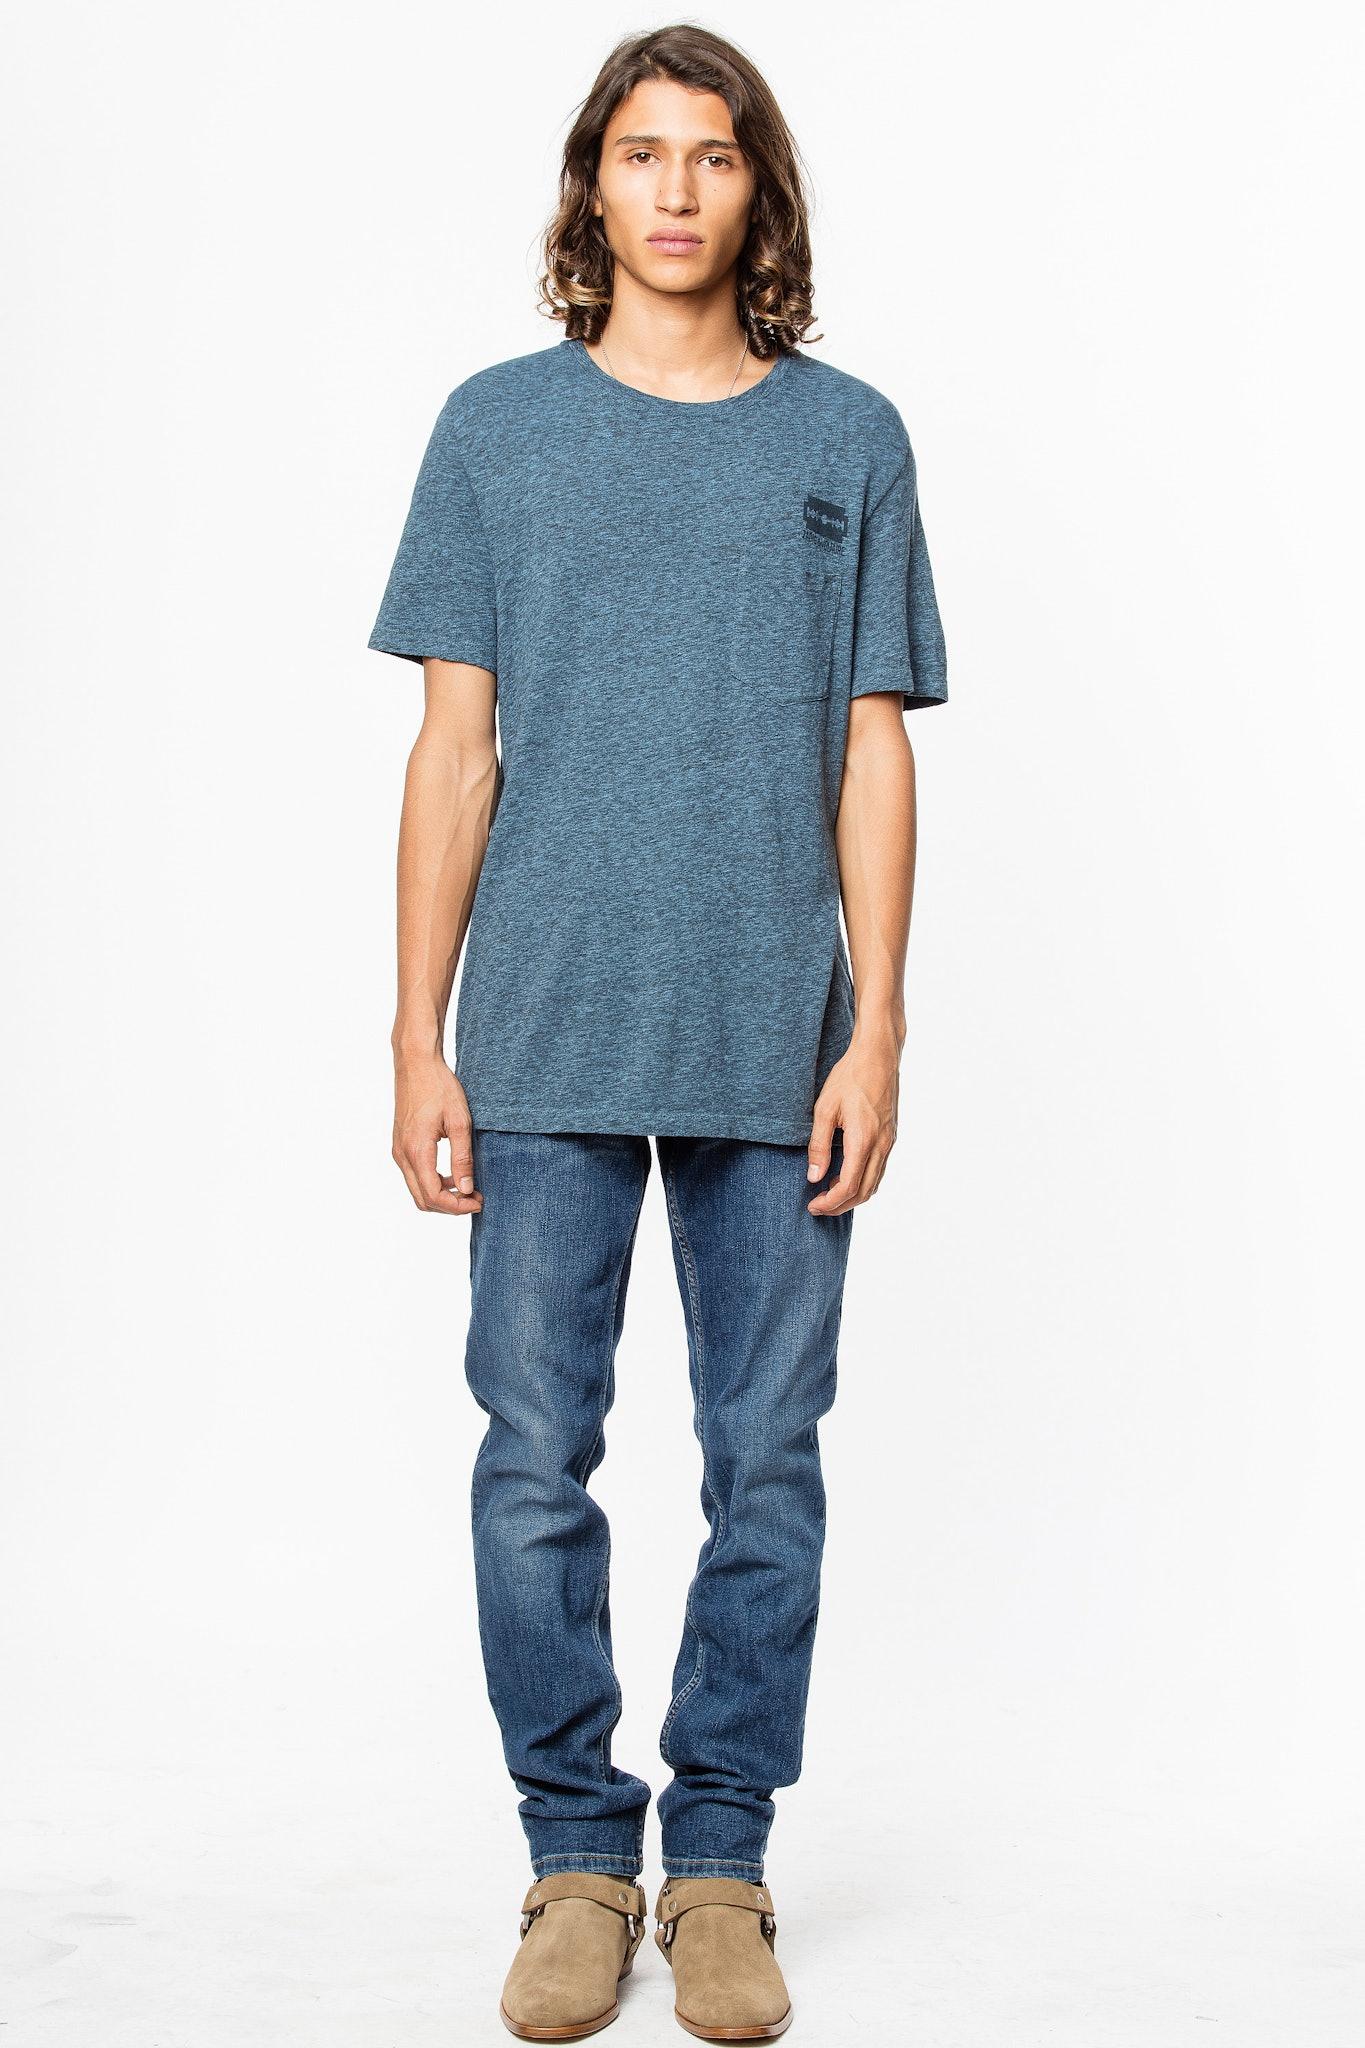 David jeans